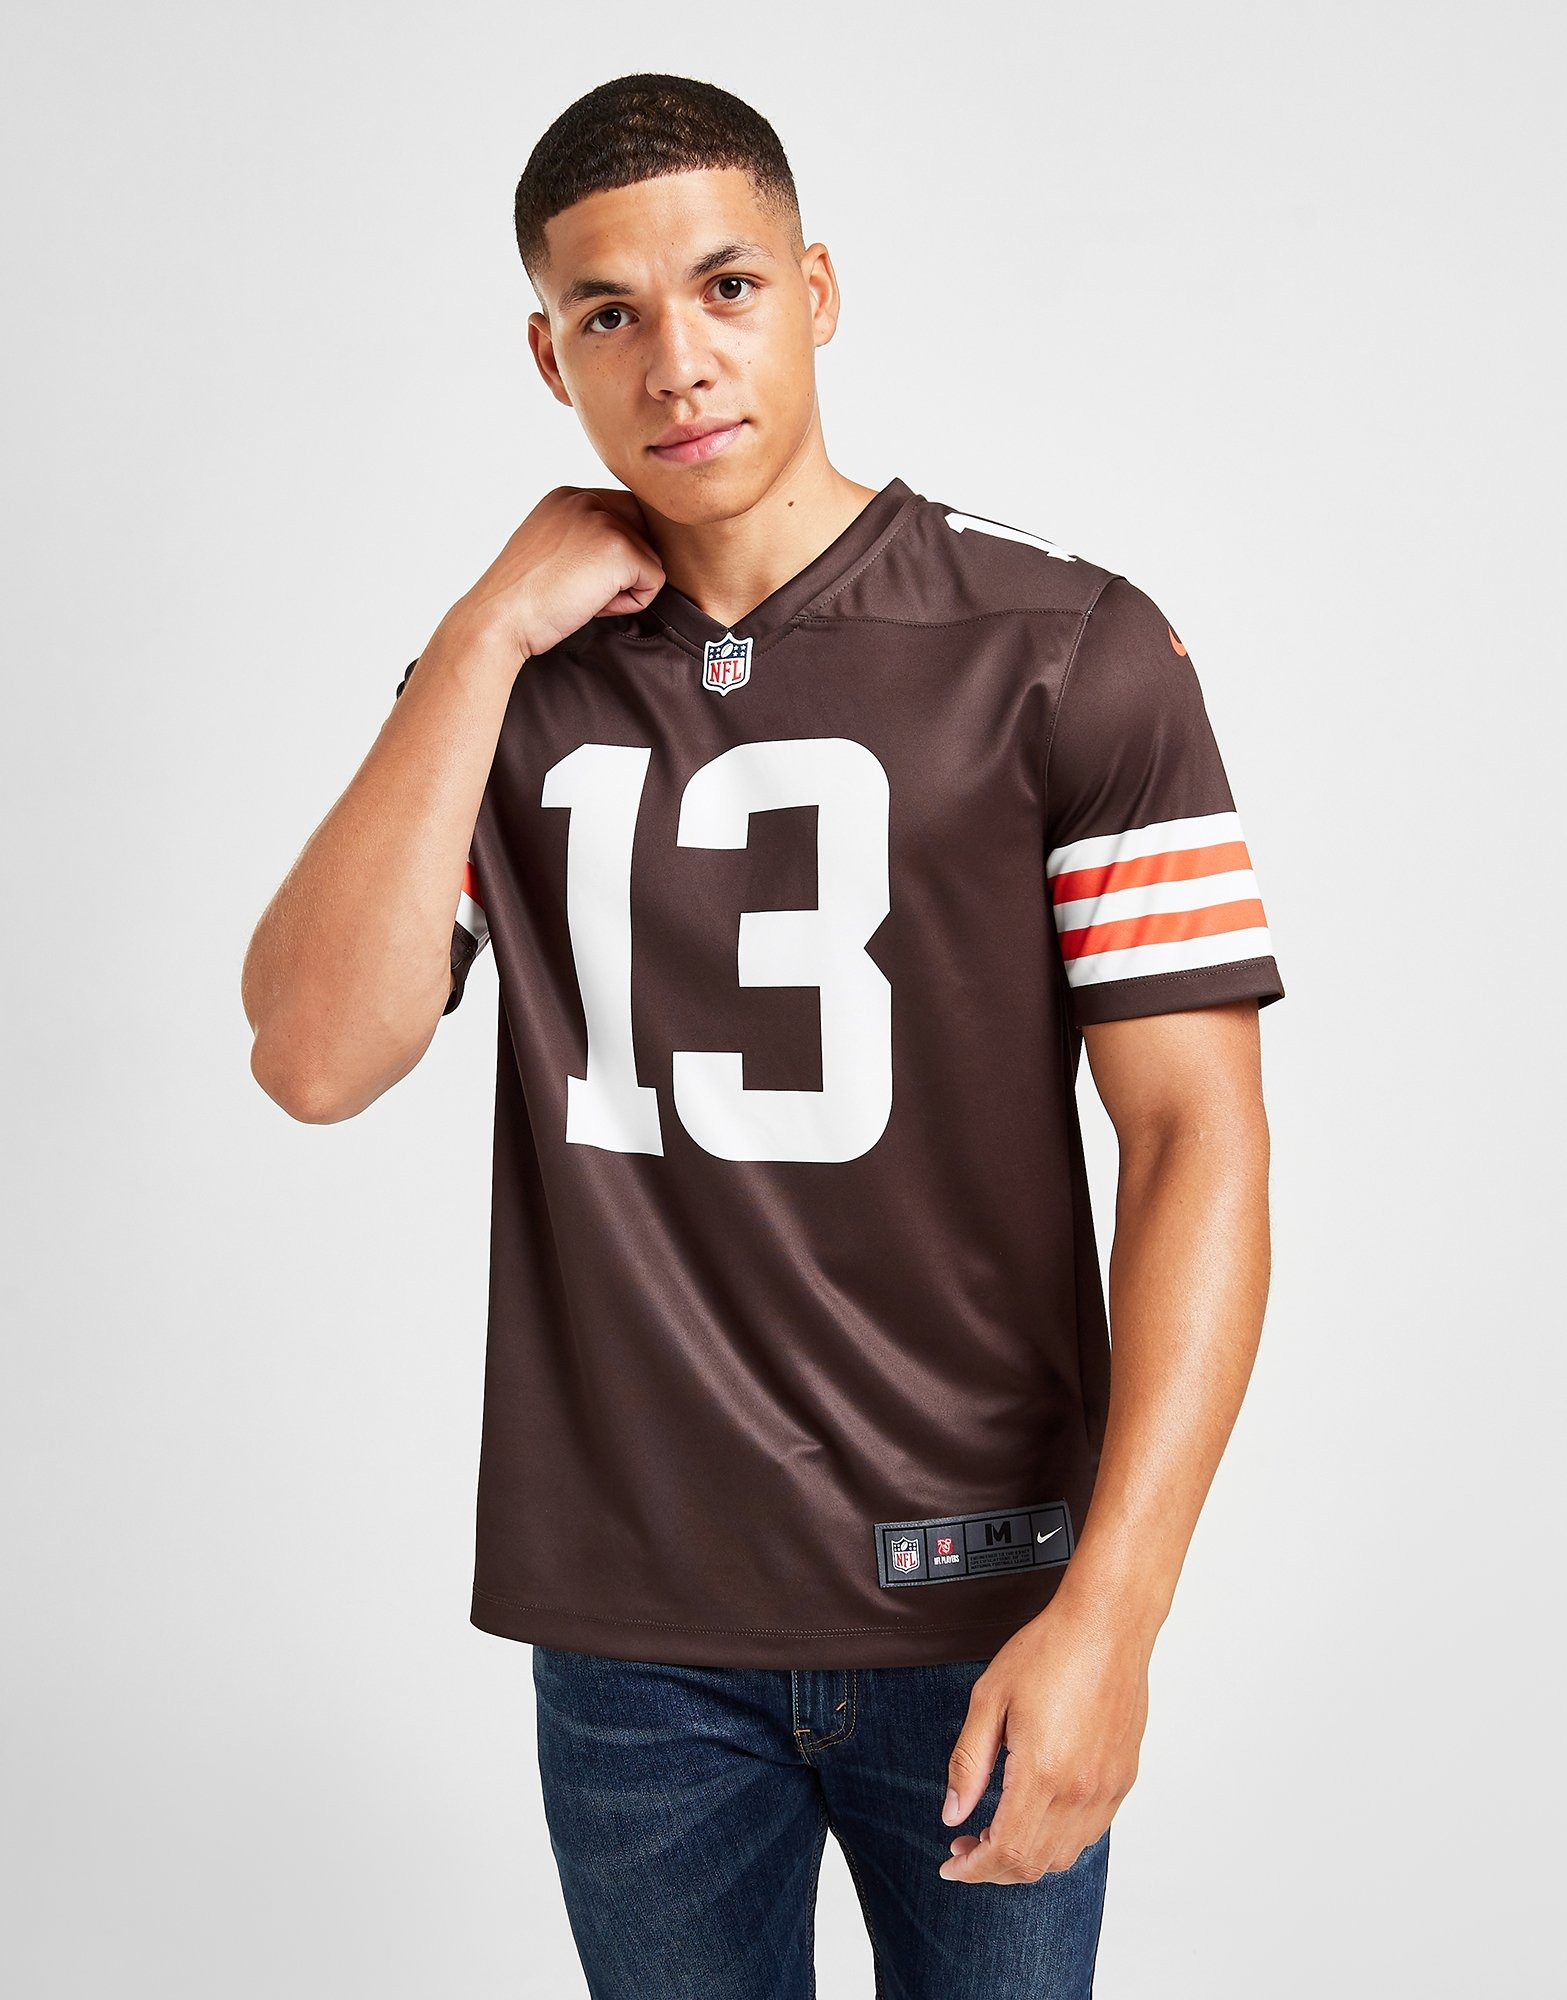 Inducir Incesante Planificado  Compra Nike camiseta NFL Cleveland Browns Beckham Jr. #13 en Marrón